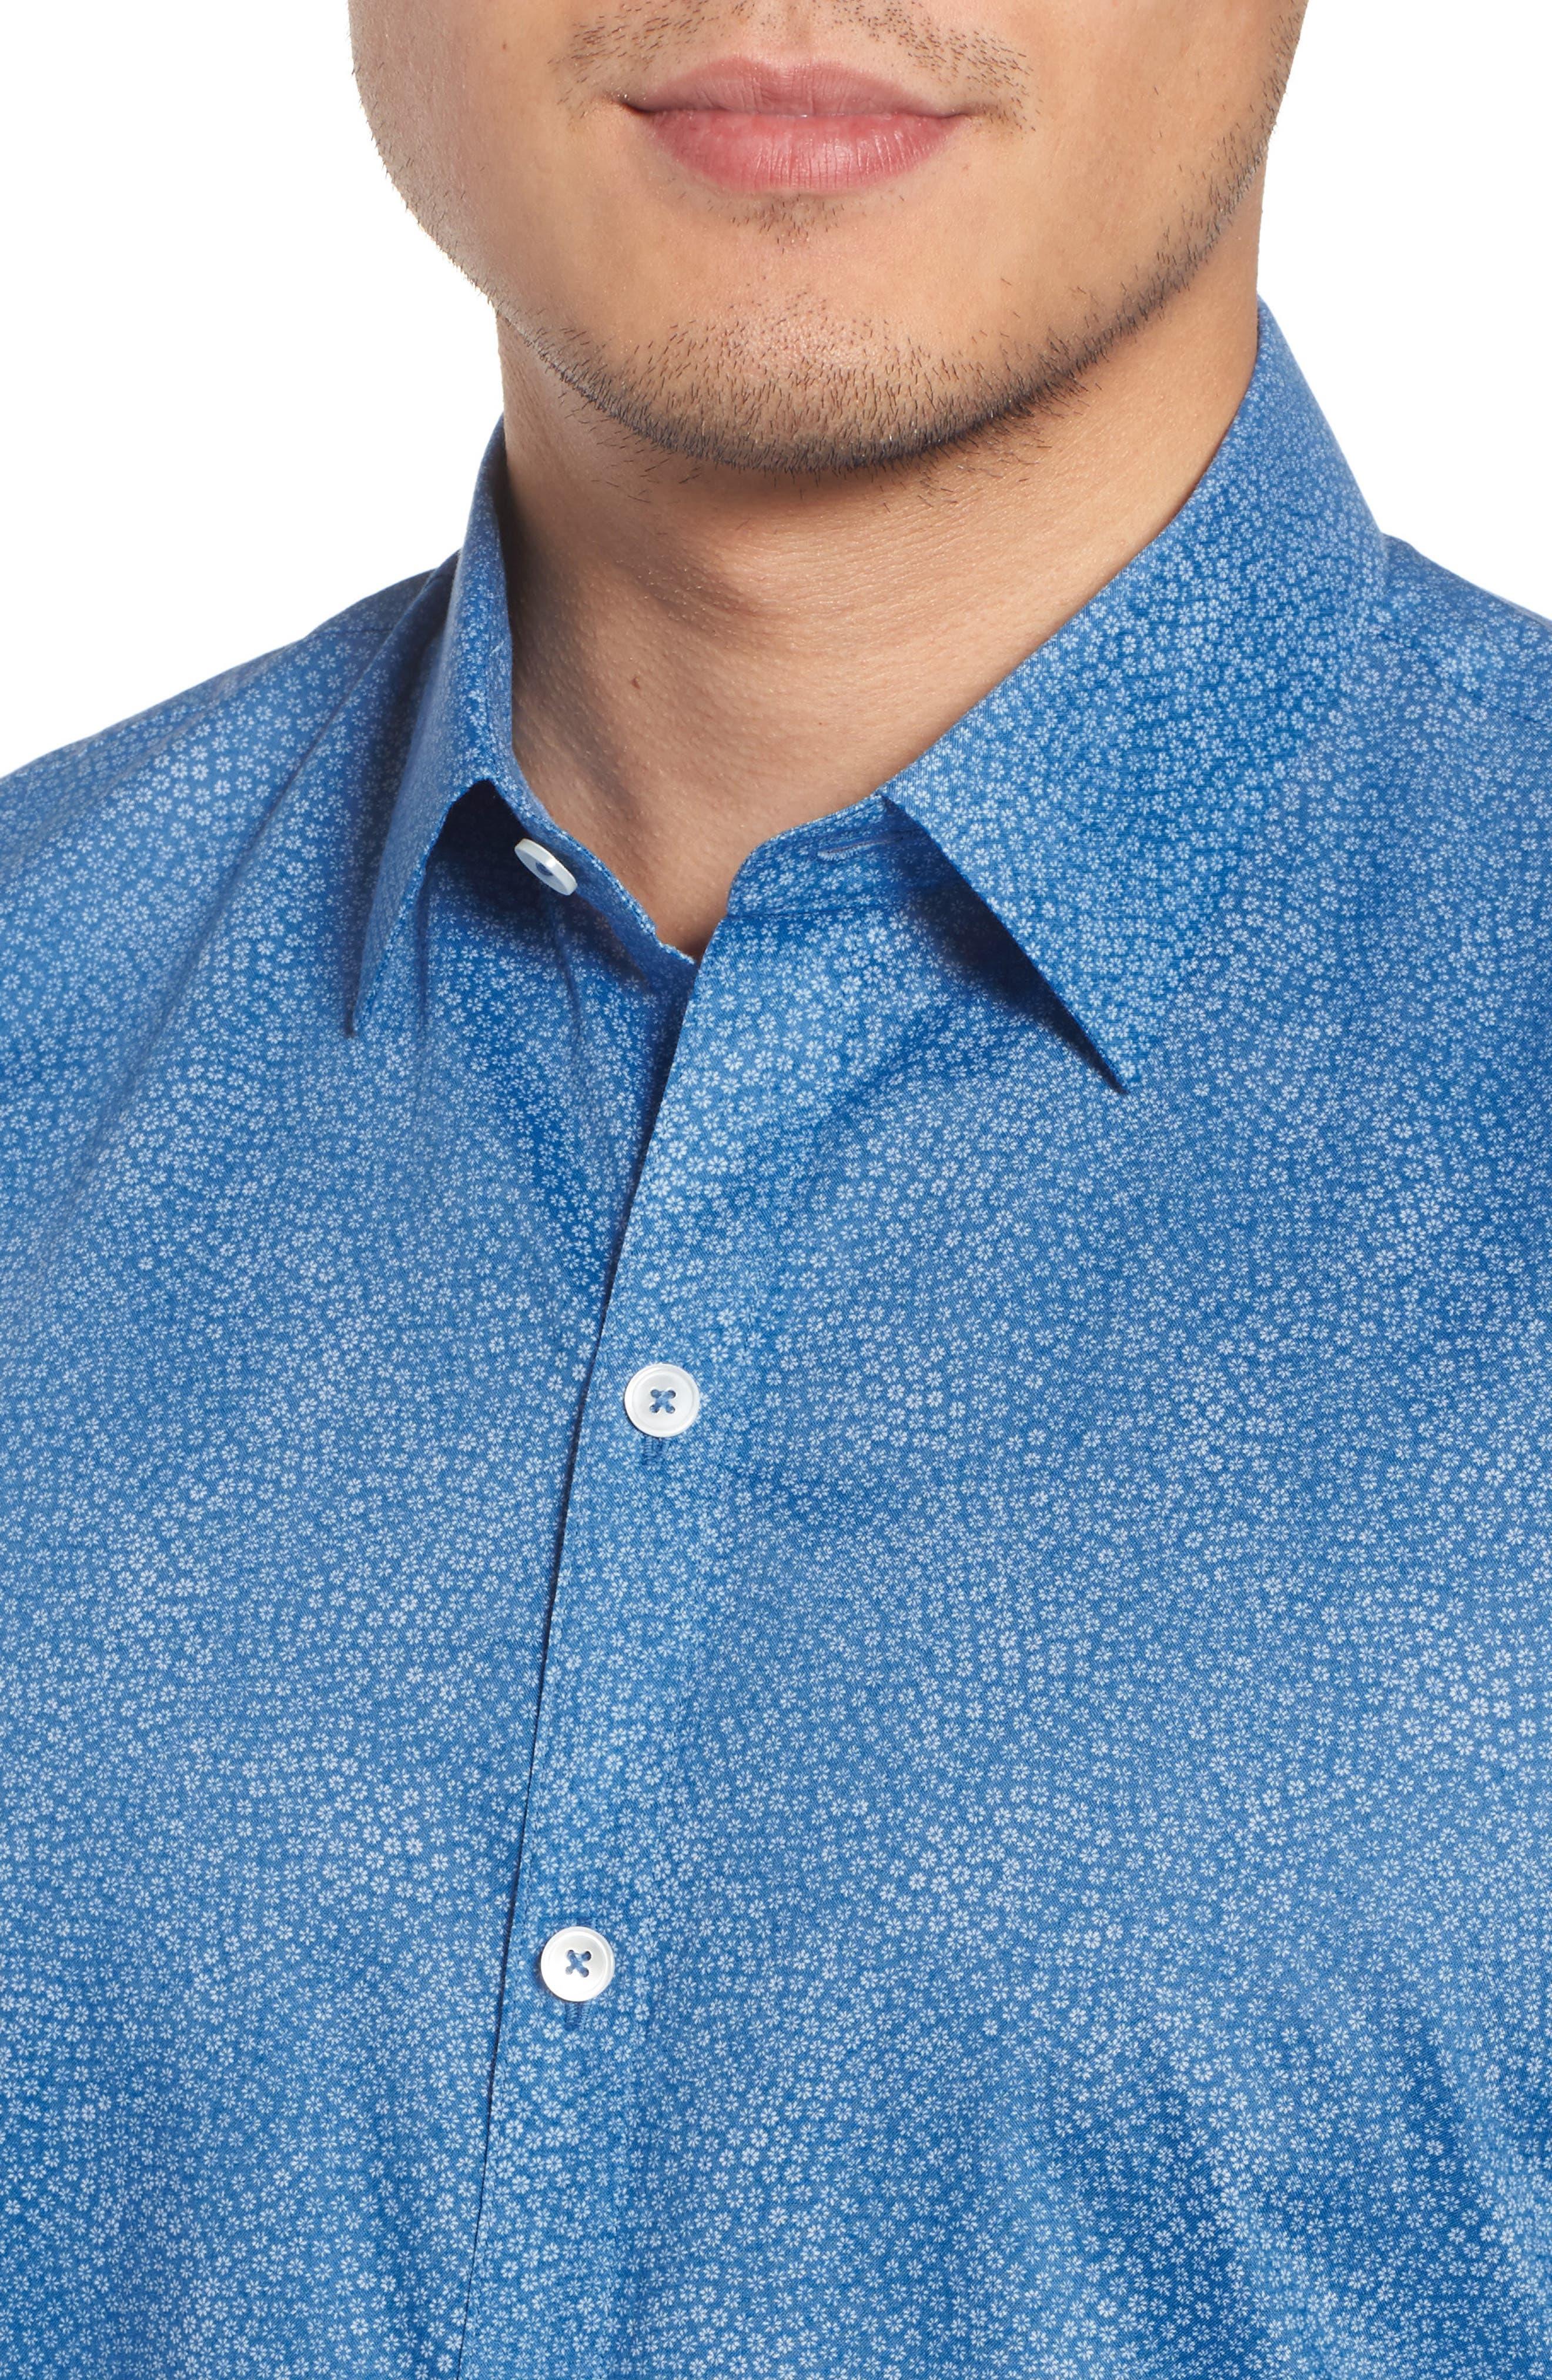 Siguenza Floral Short Sleeve Sport Shirt,                             Alternate thumbnail 4, color,                             400